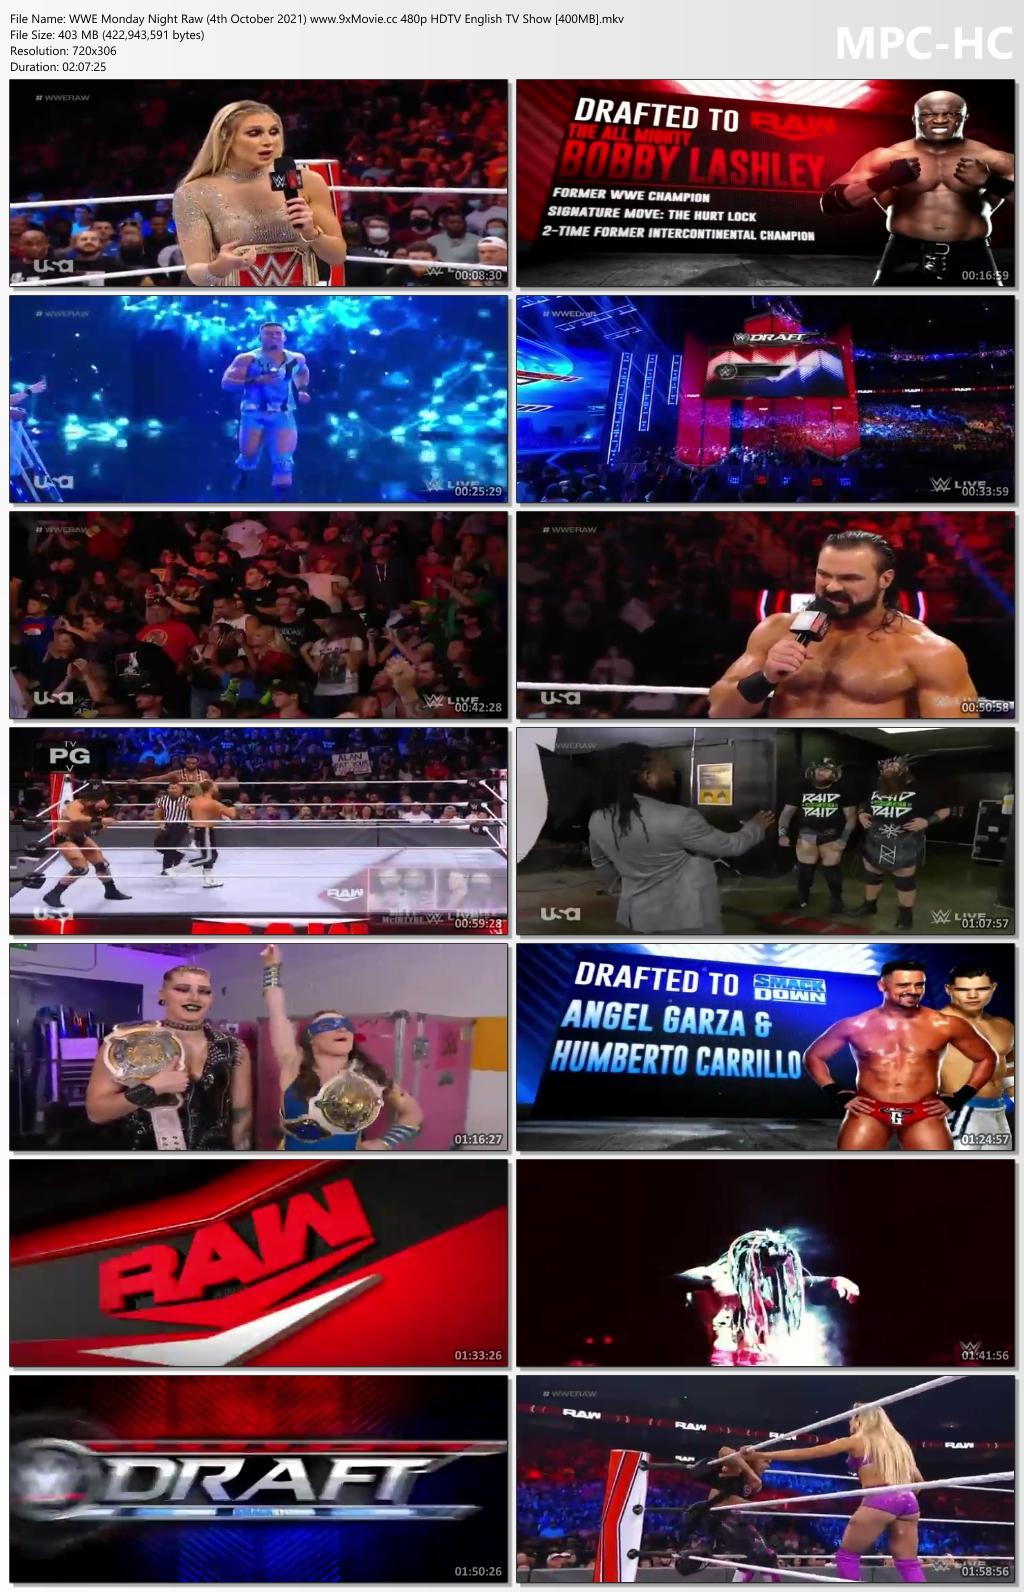 WWE-Monday-Night-Raw-4th-October-2021-www-9x-Movie-cc-480p-HDTV-English-TV-Show-400-MB-mkv